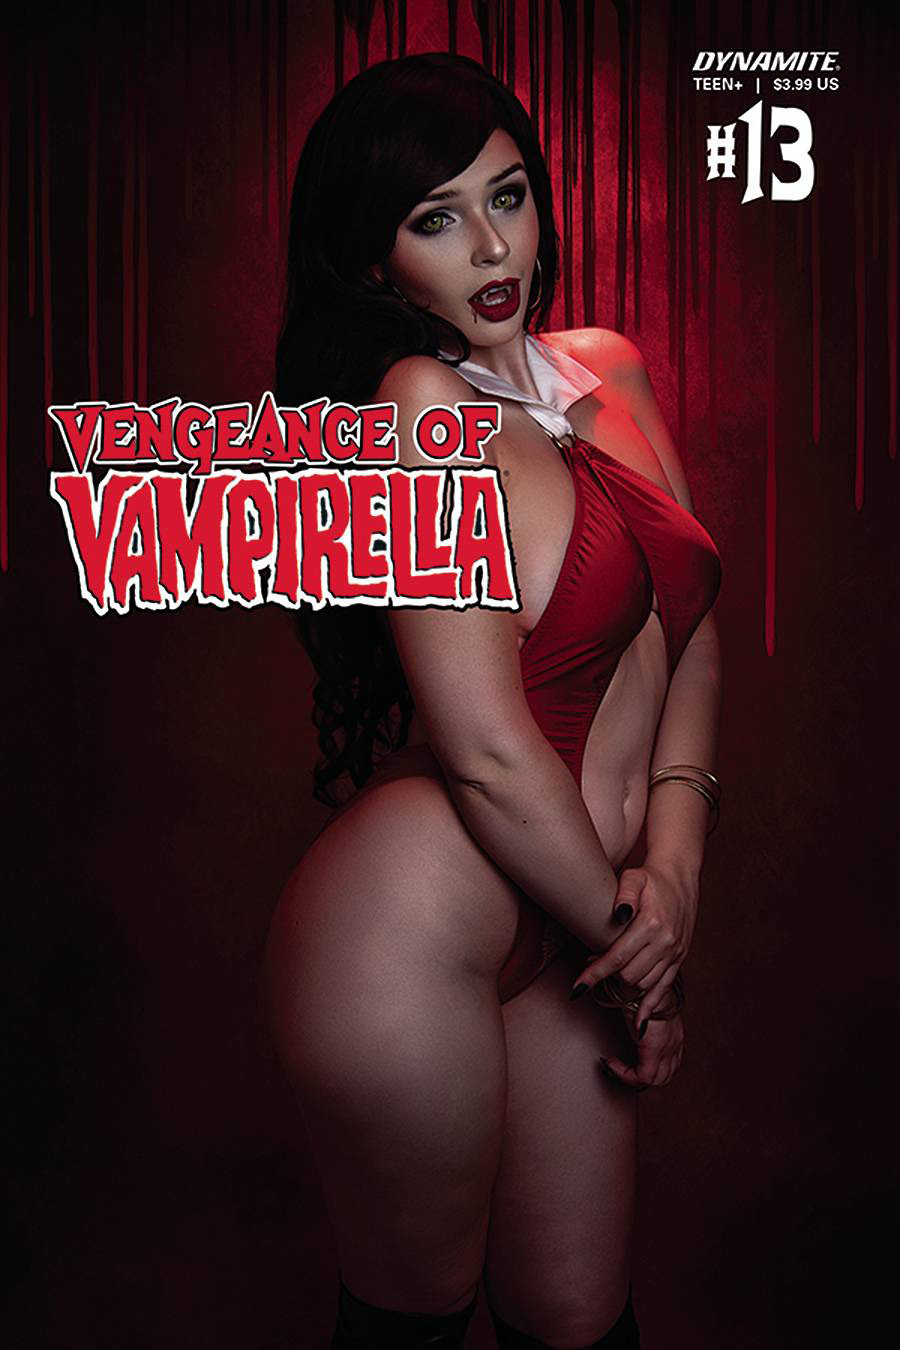 Vengeance Of Vampirella Vol 2 #13 Cover D Variant Hailey Scott Cosplay Photo Cover